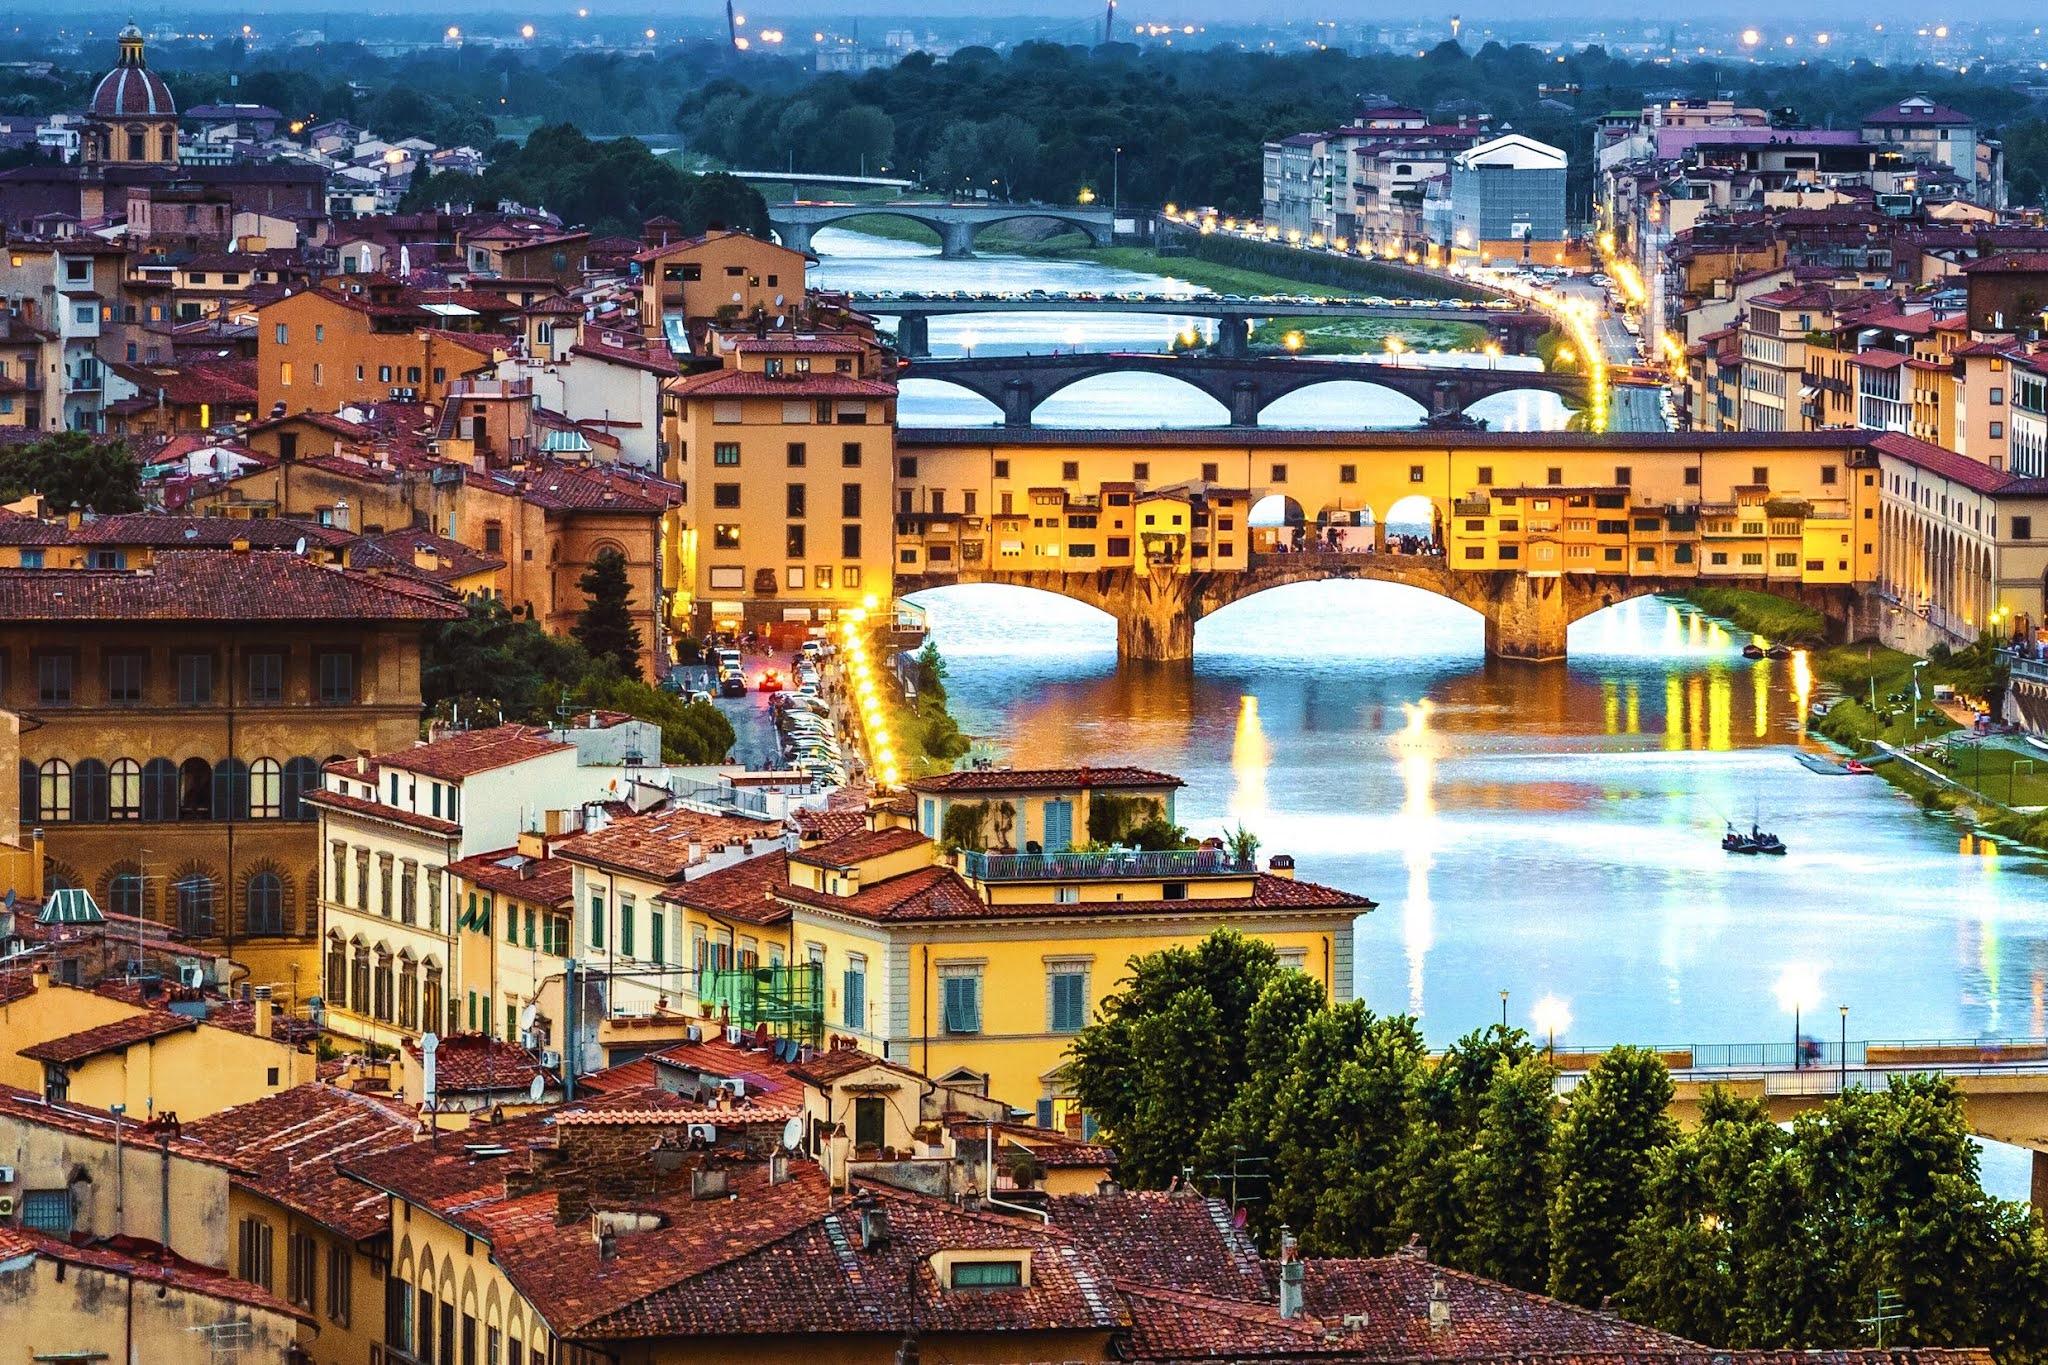 Tuscany (Florence, Siena, Pisa) Travel Guide